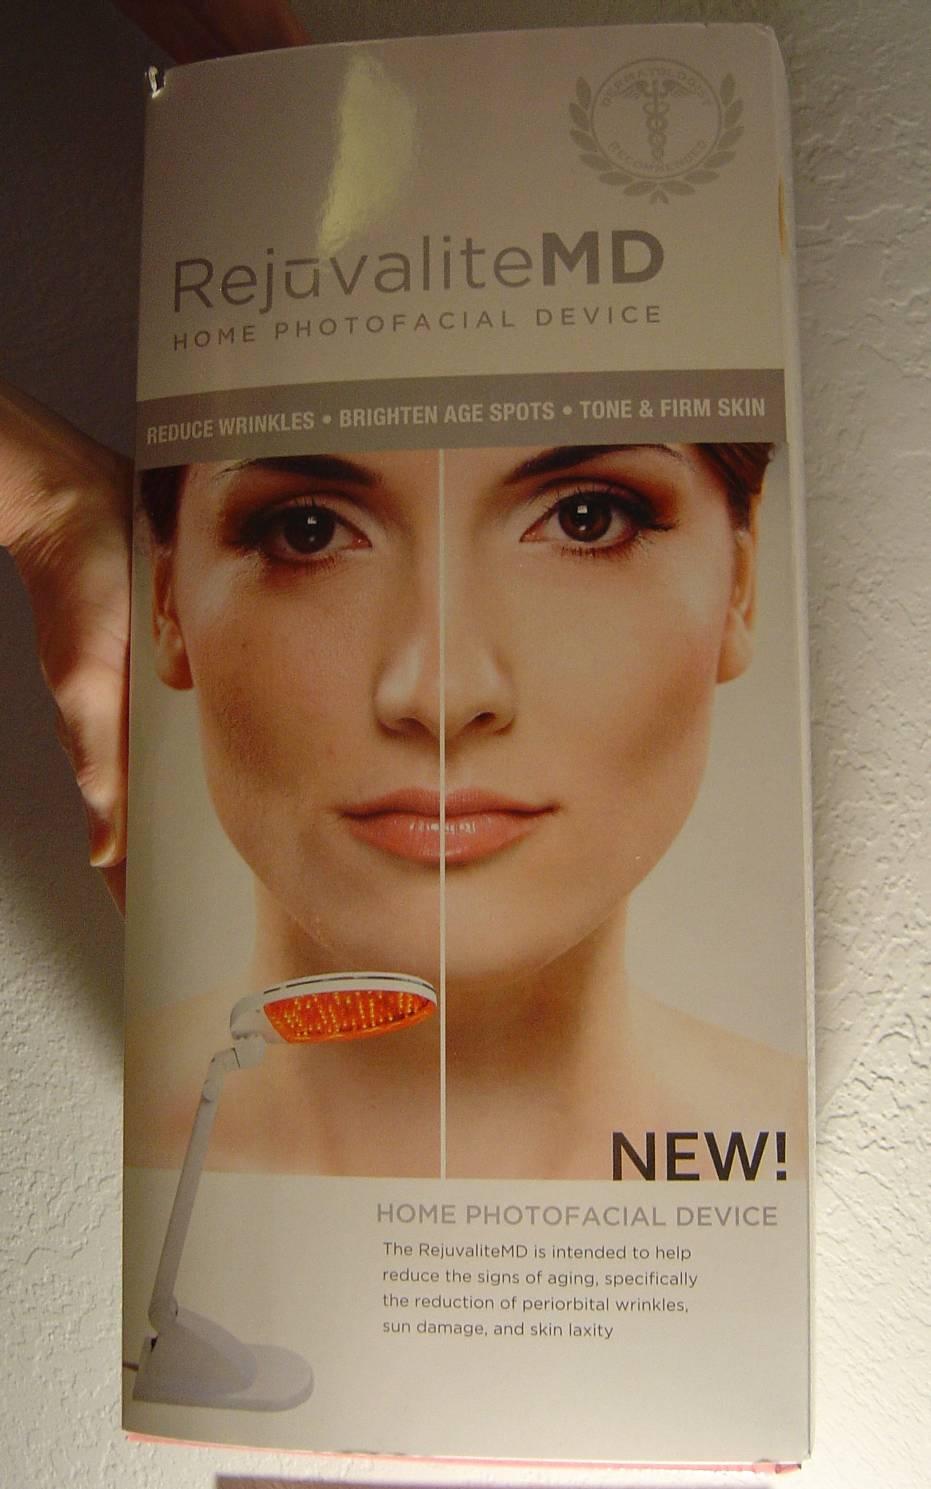 RejuvaliteMD Home Photofacial Device